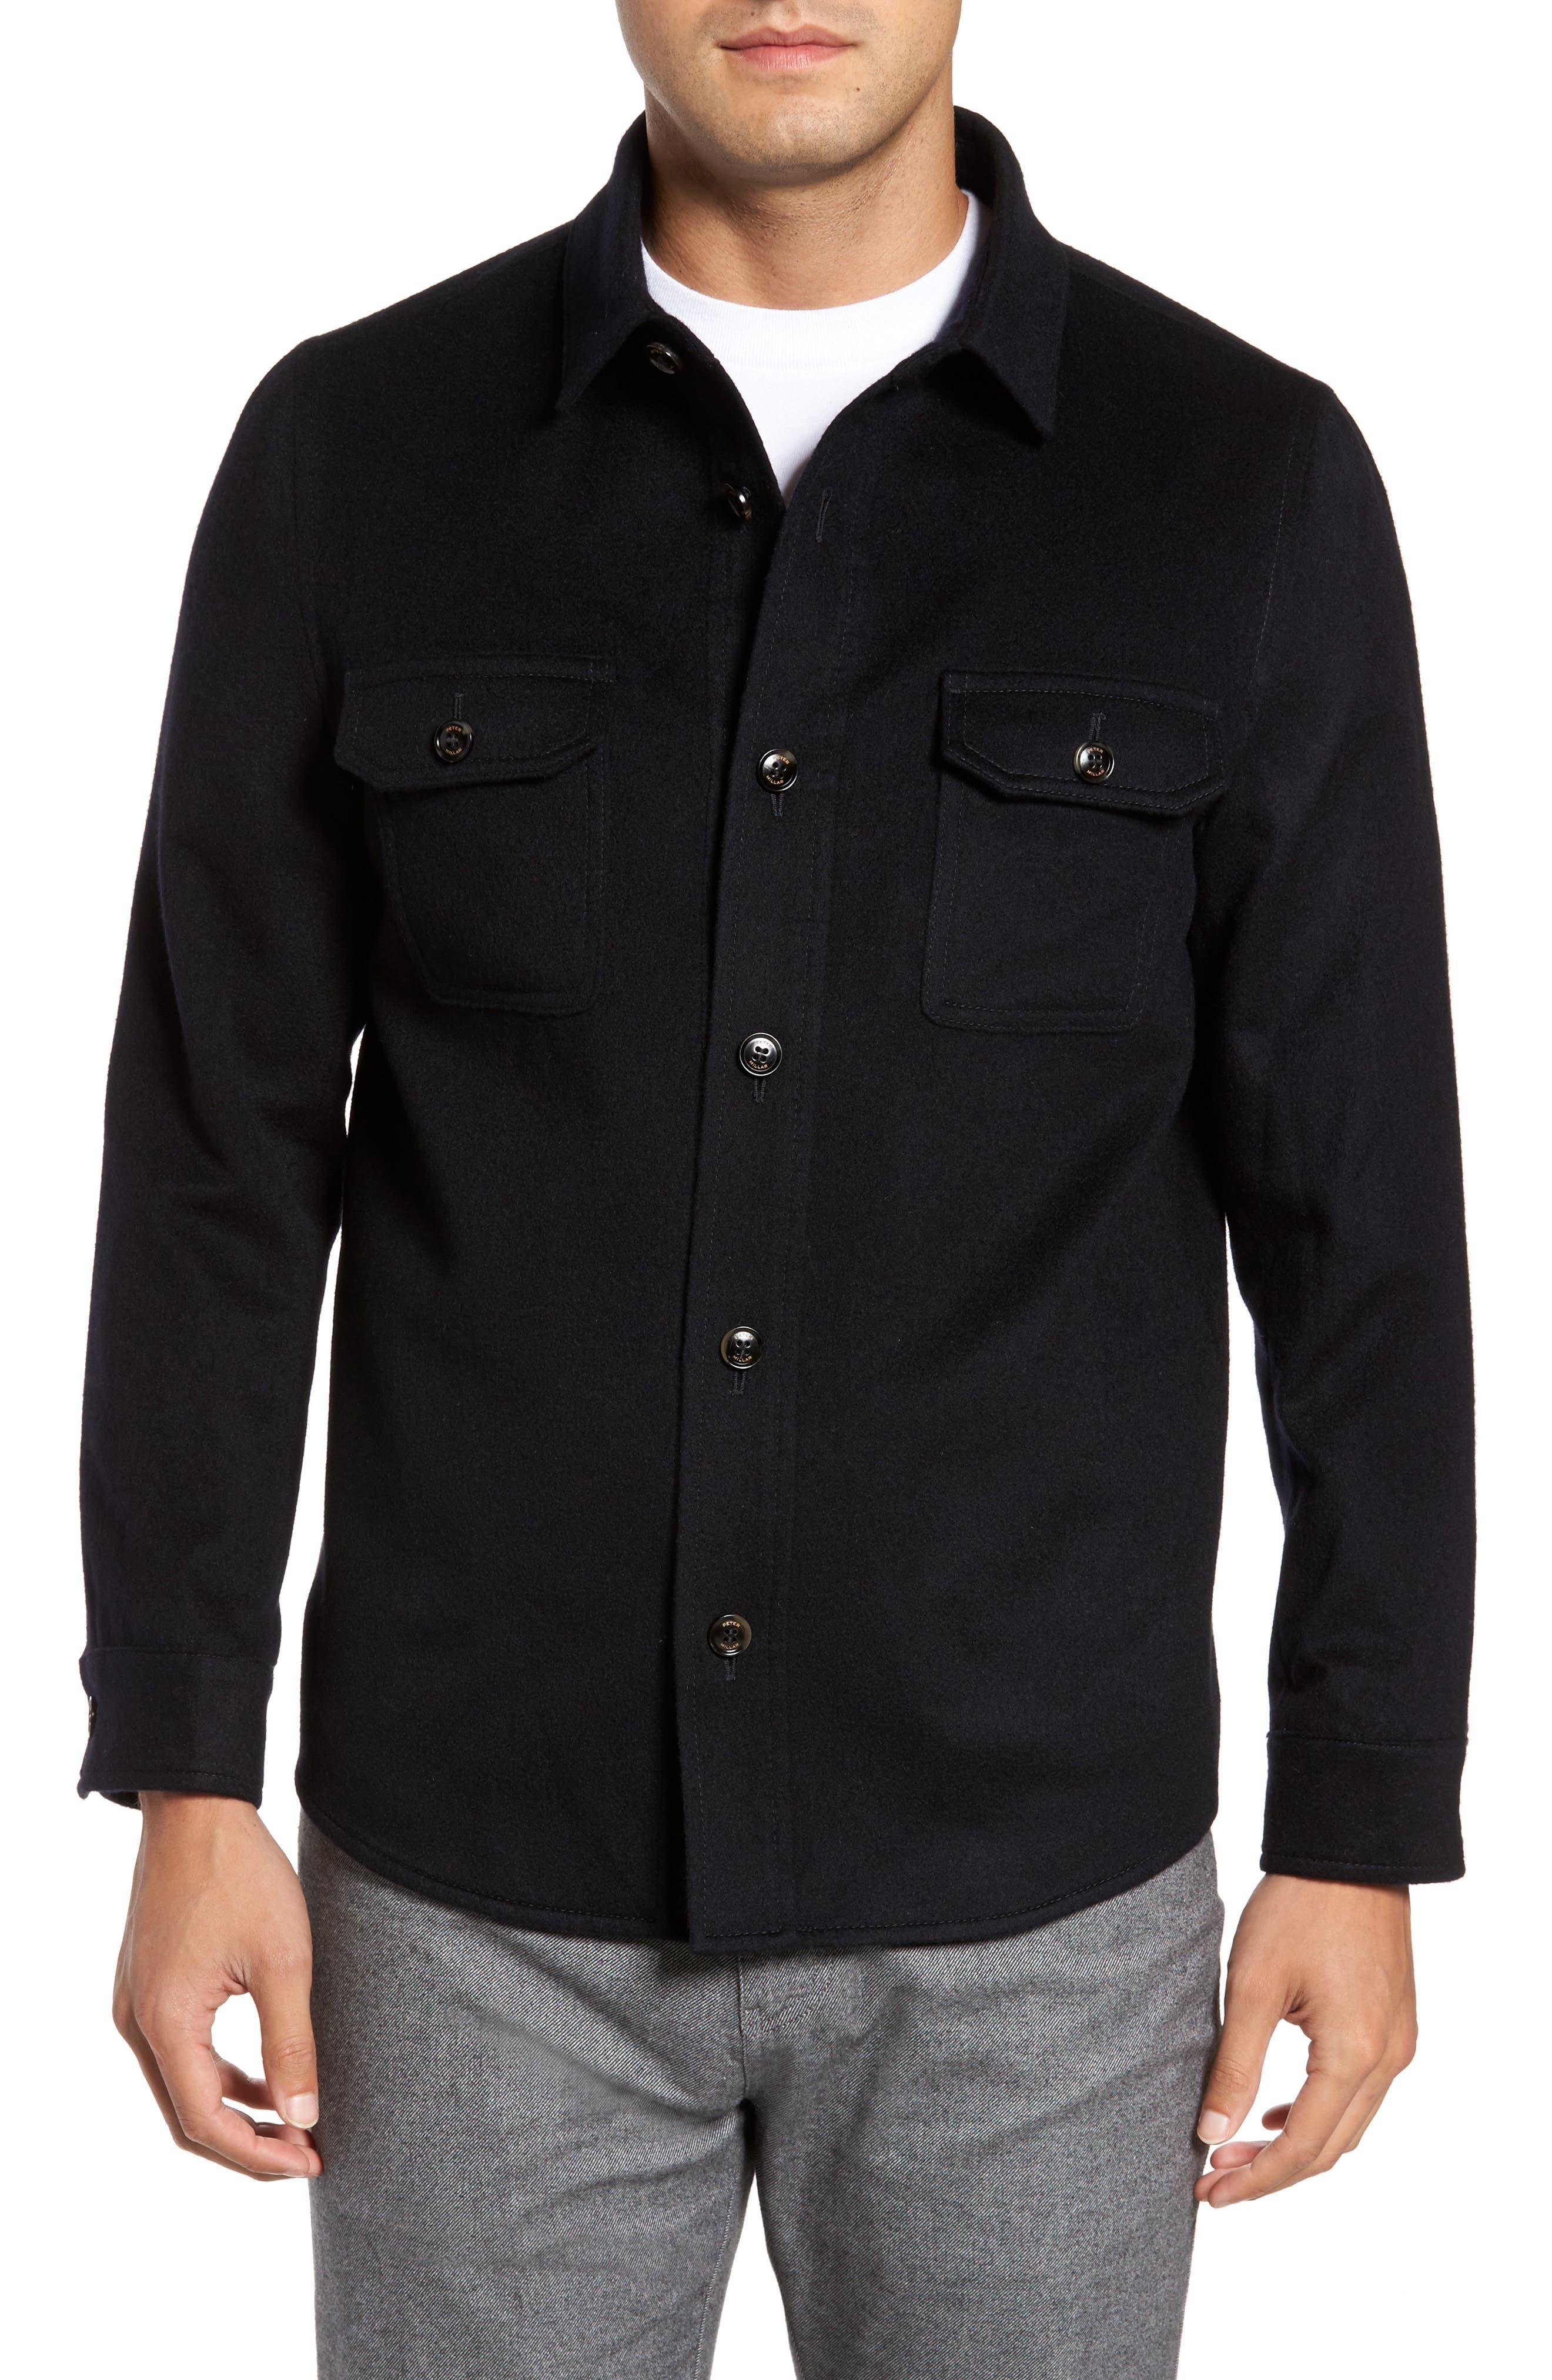 Main Image - Peter Millar Collection Featherweight Journeyman Cashmere Shirt Jacket